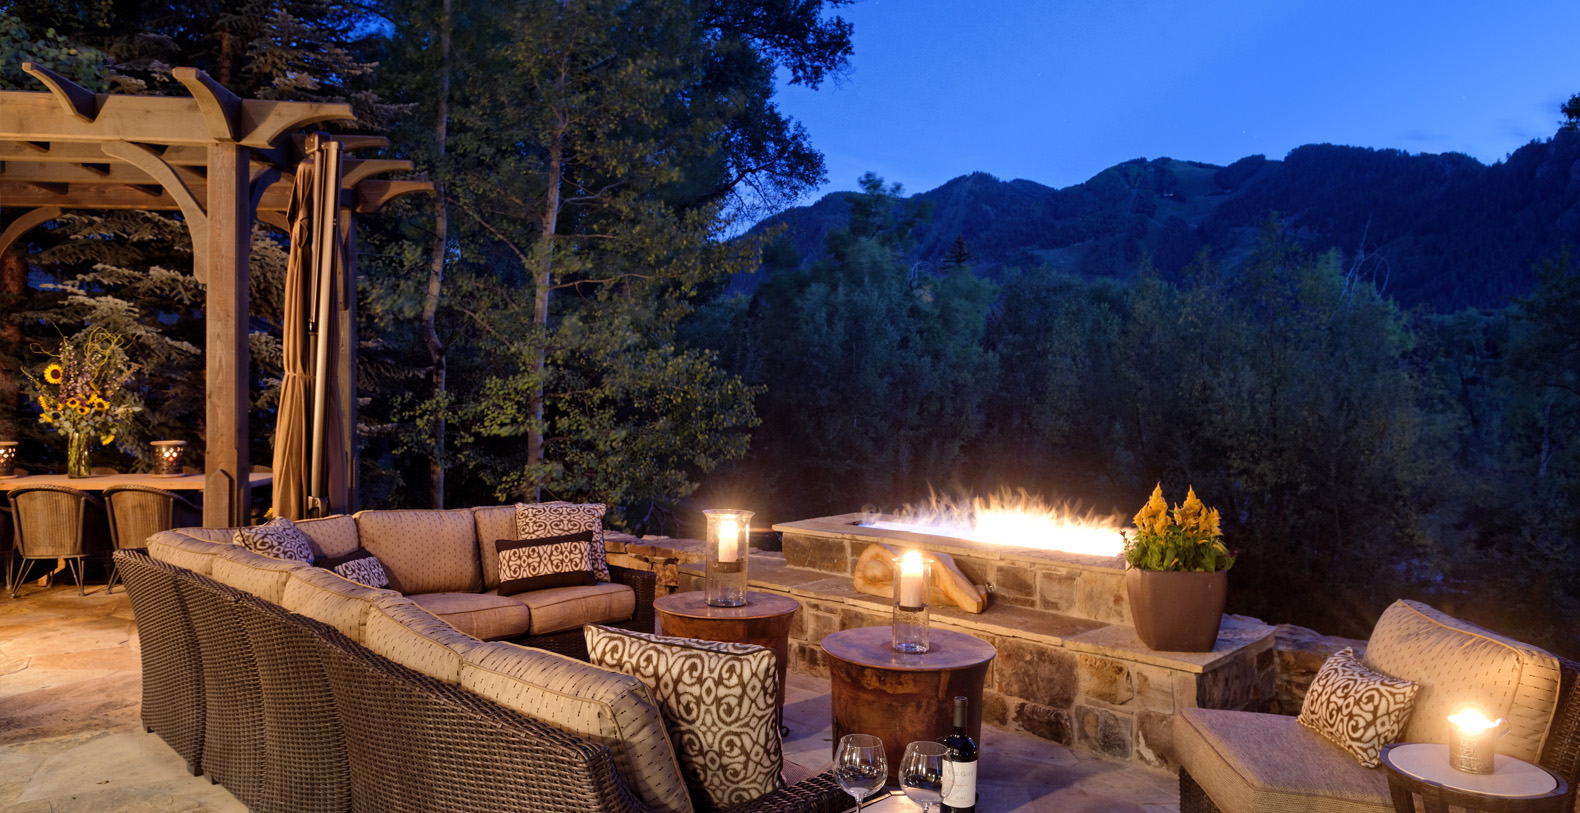 Tahoe Keys Vacation Rentals